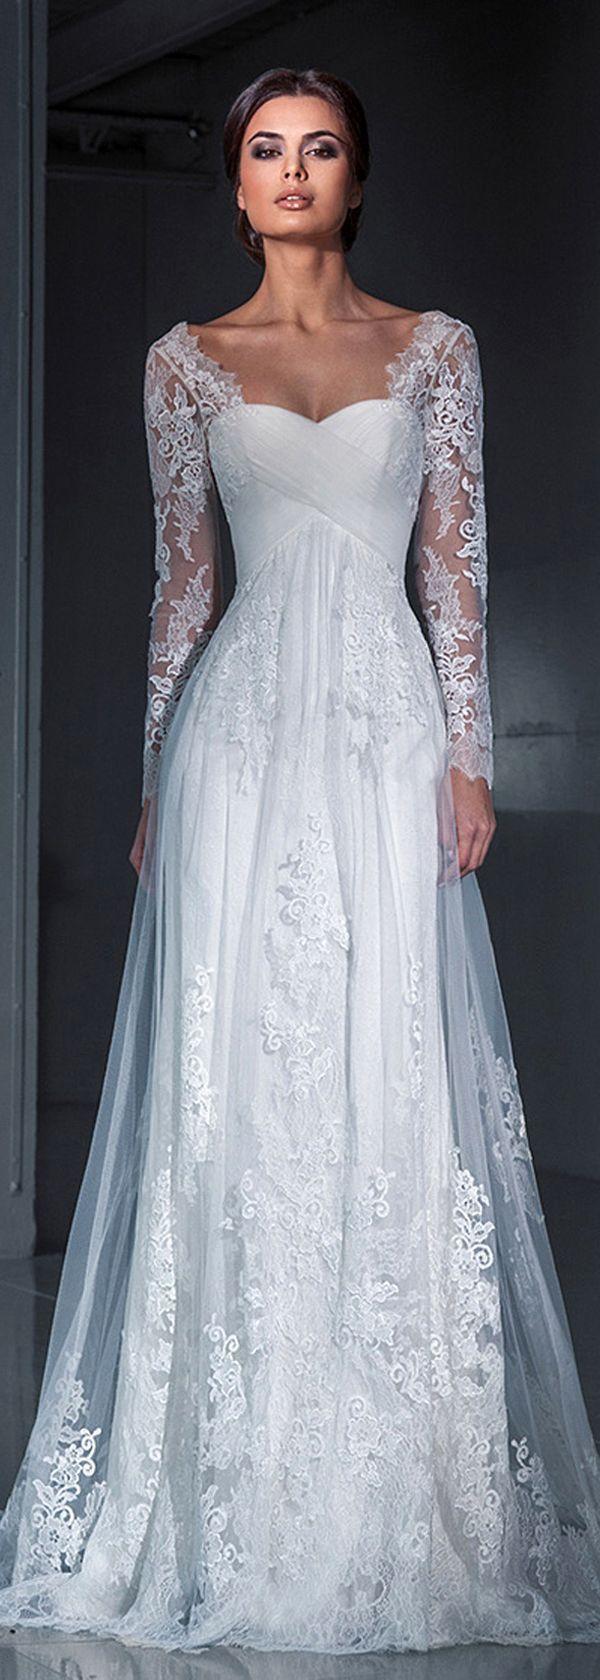 978 mejores imágenes de wedding dresses en Pinterest | Vestidos de ...